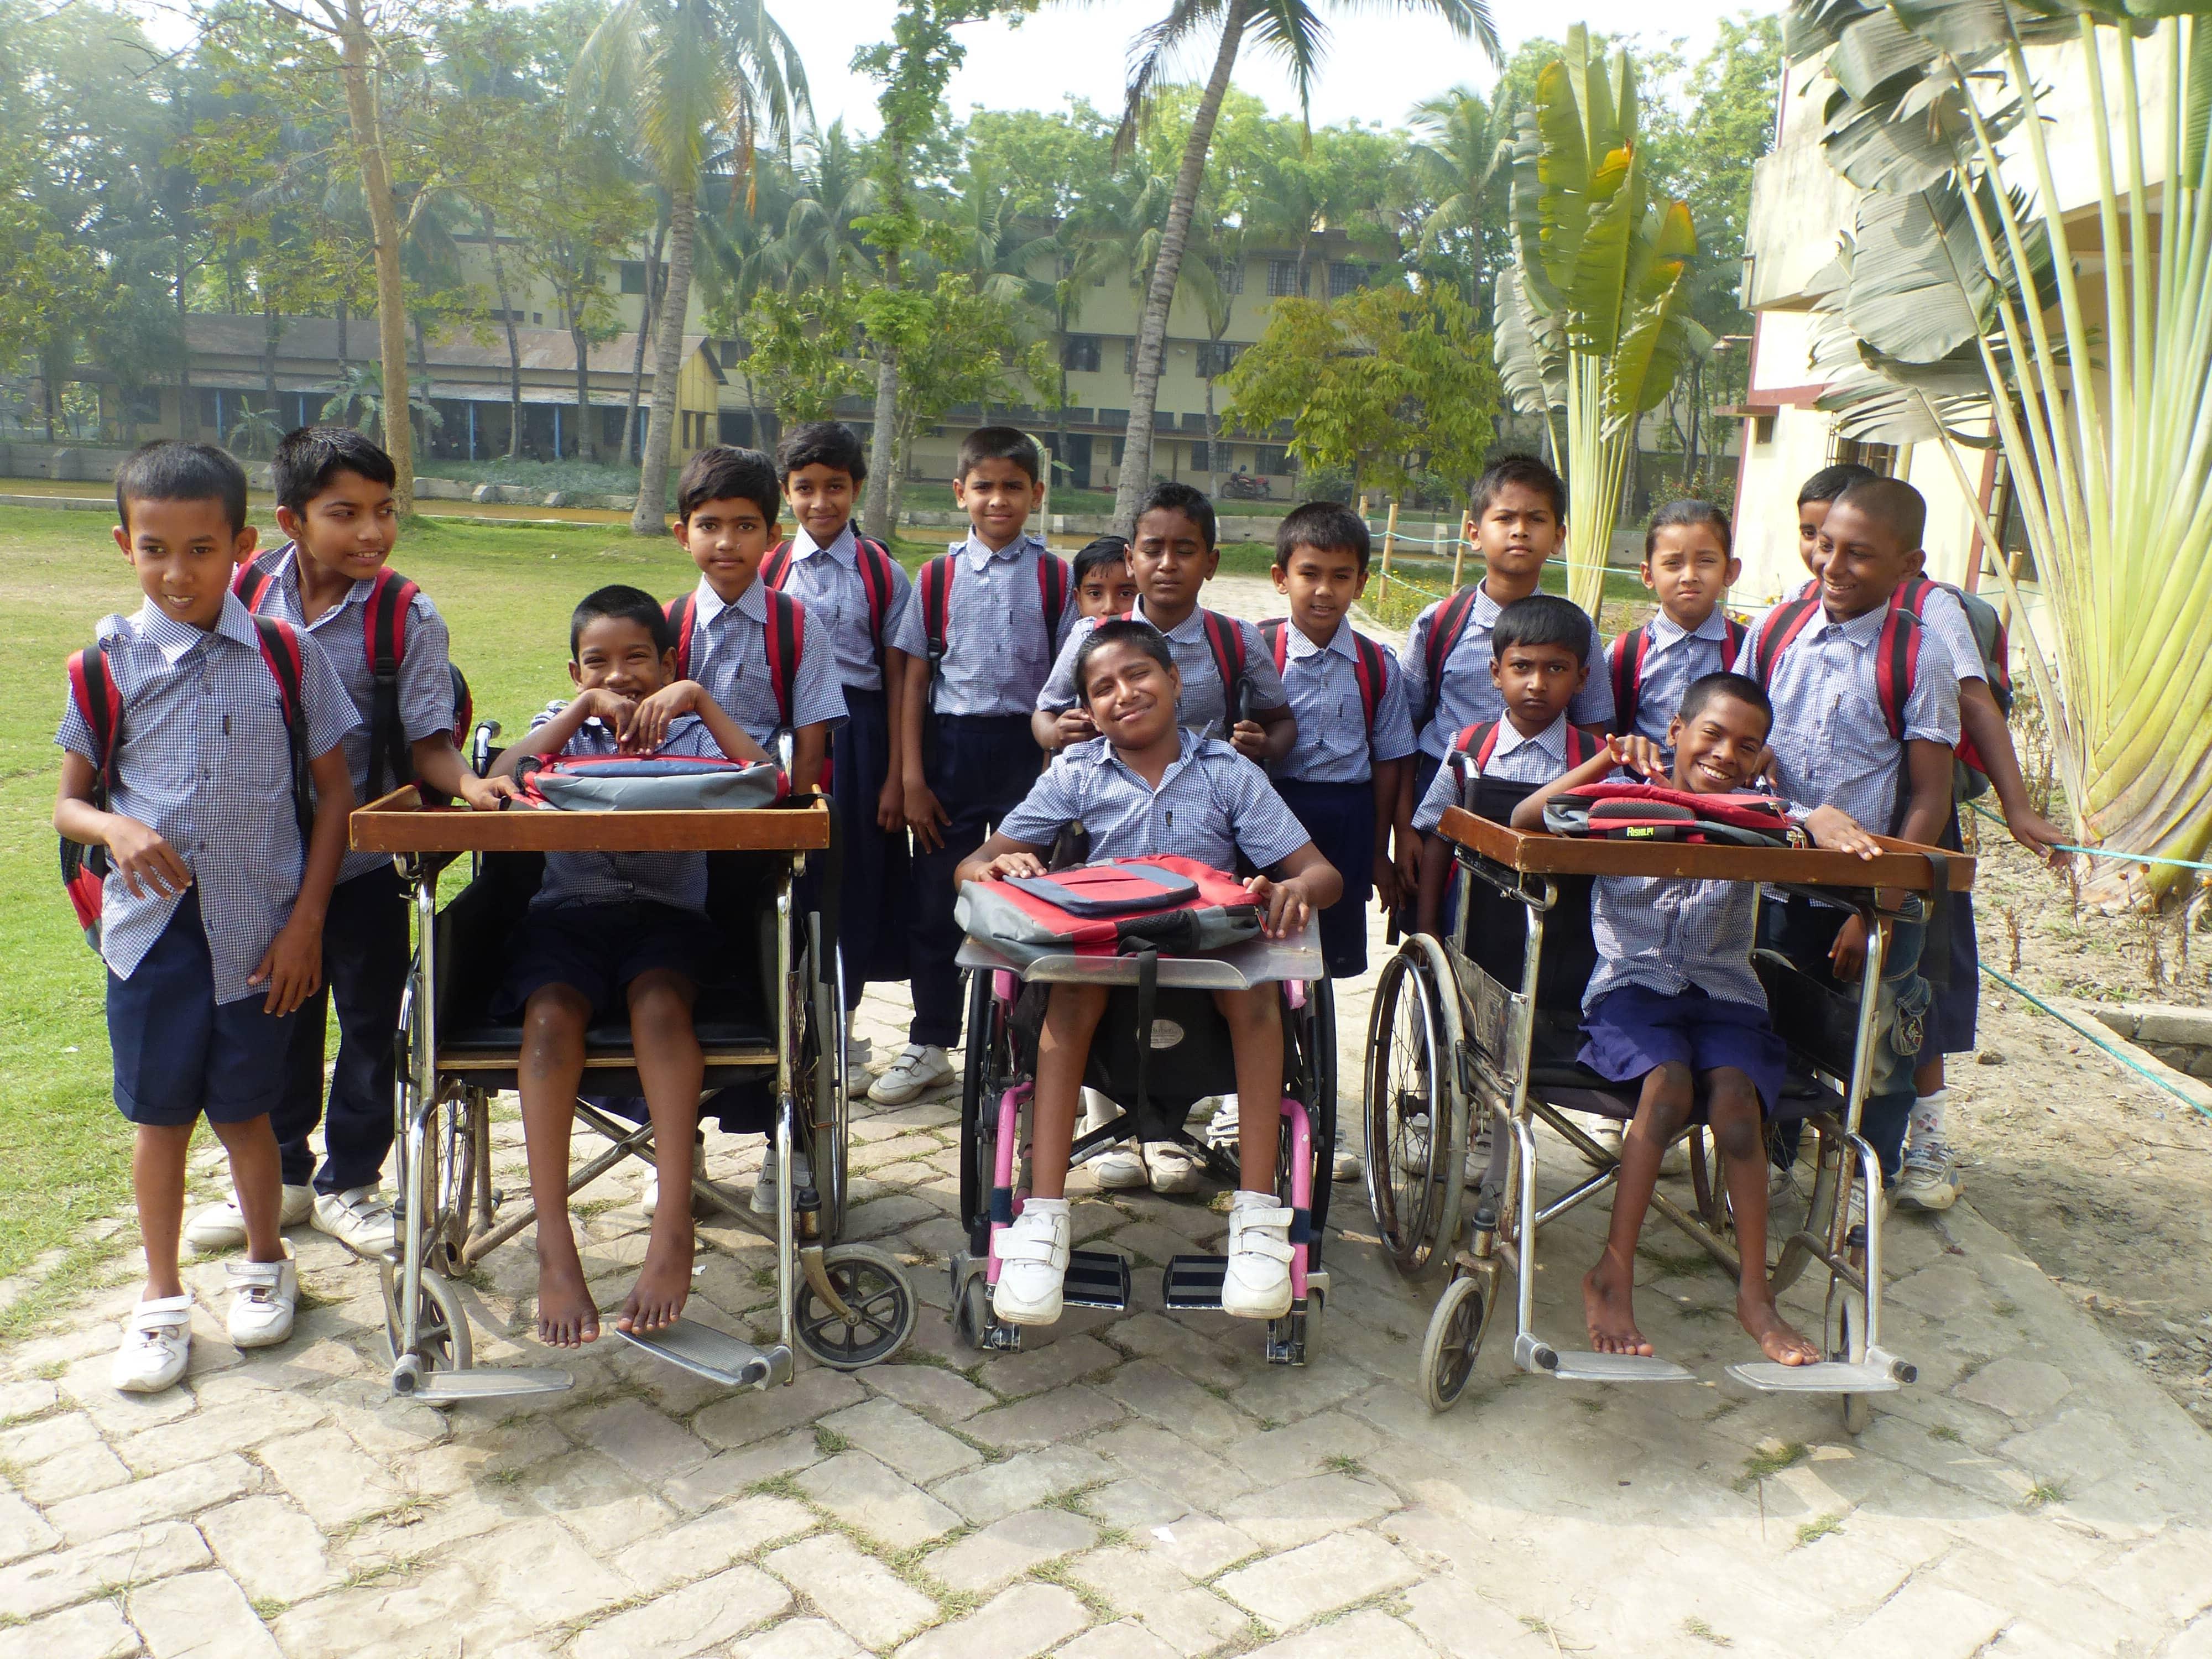 SETTEMBRE 2018 - Rishilpi International Review